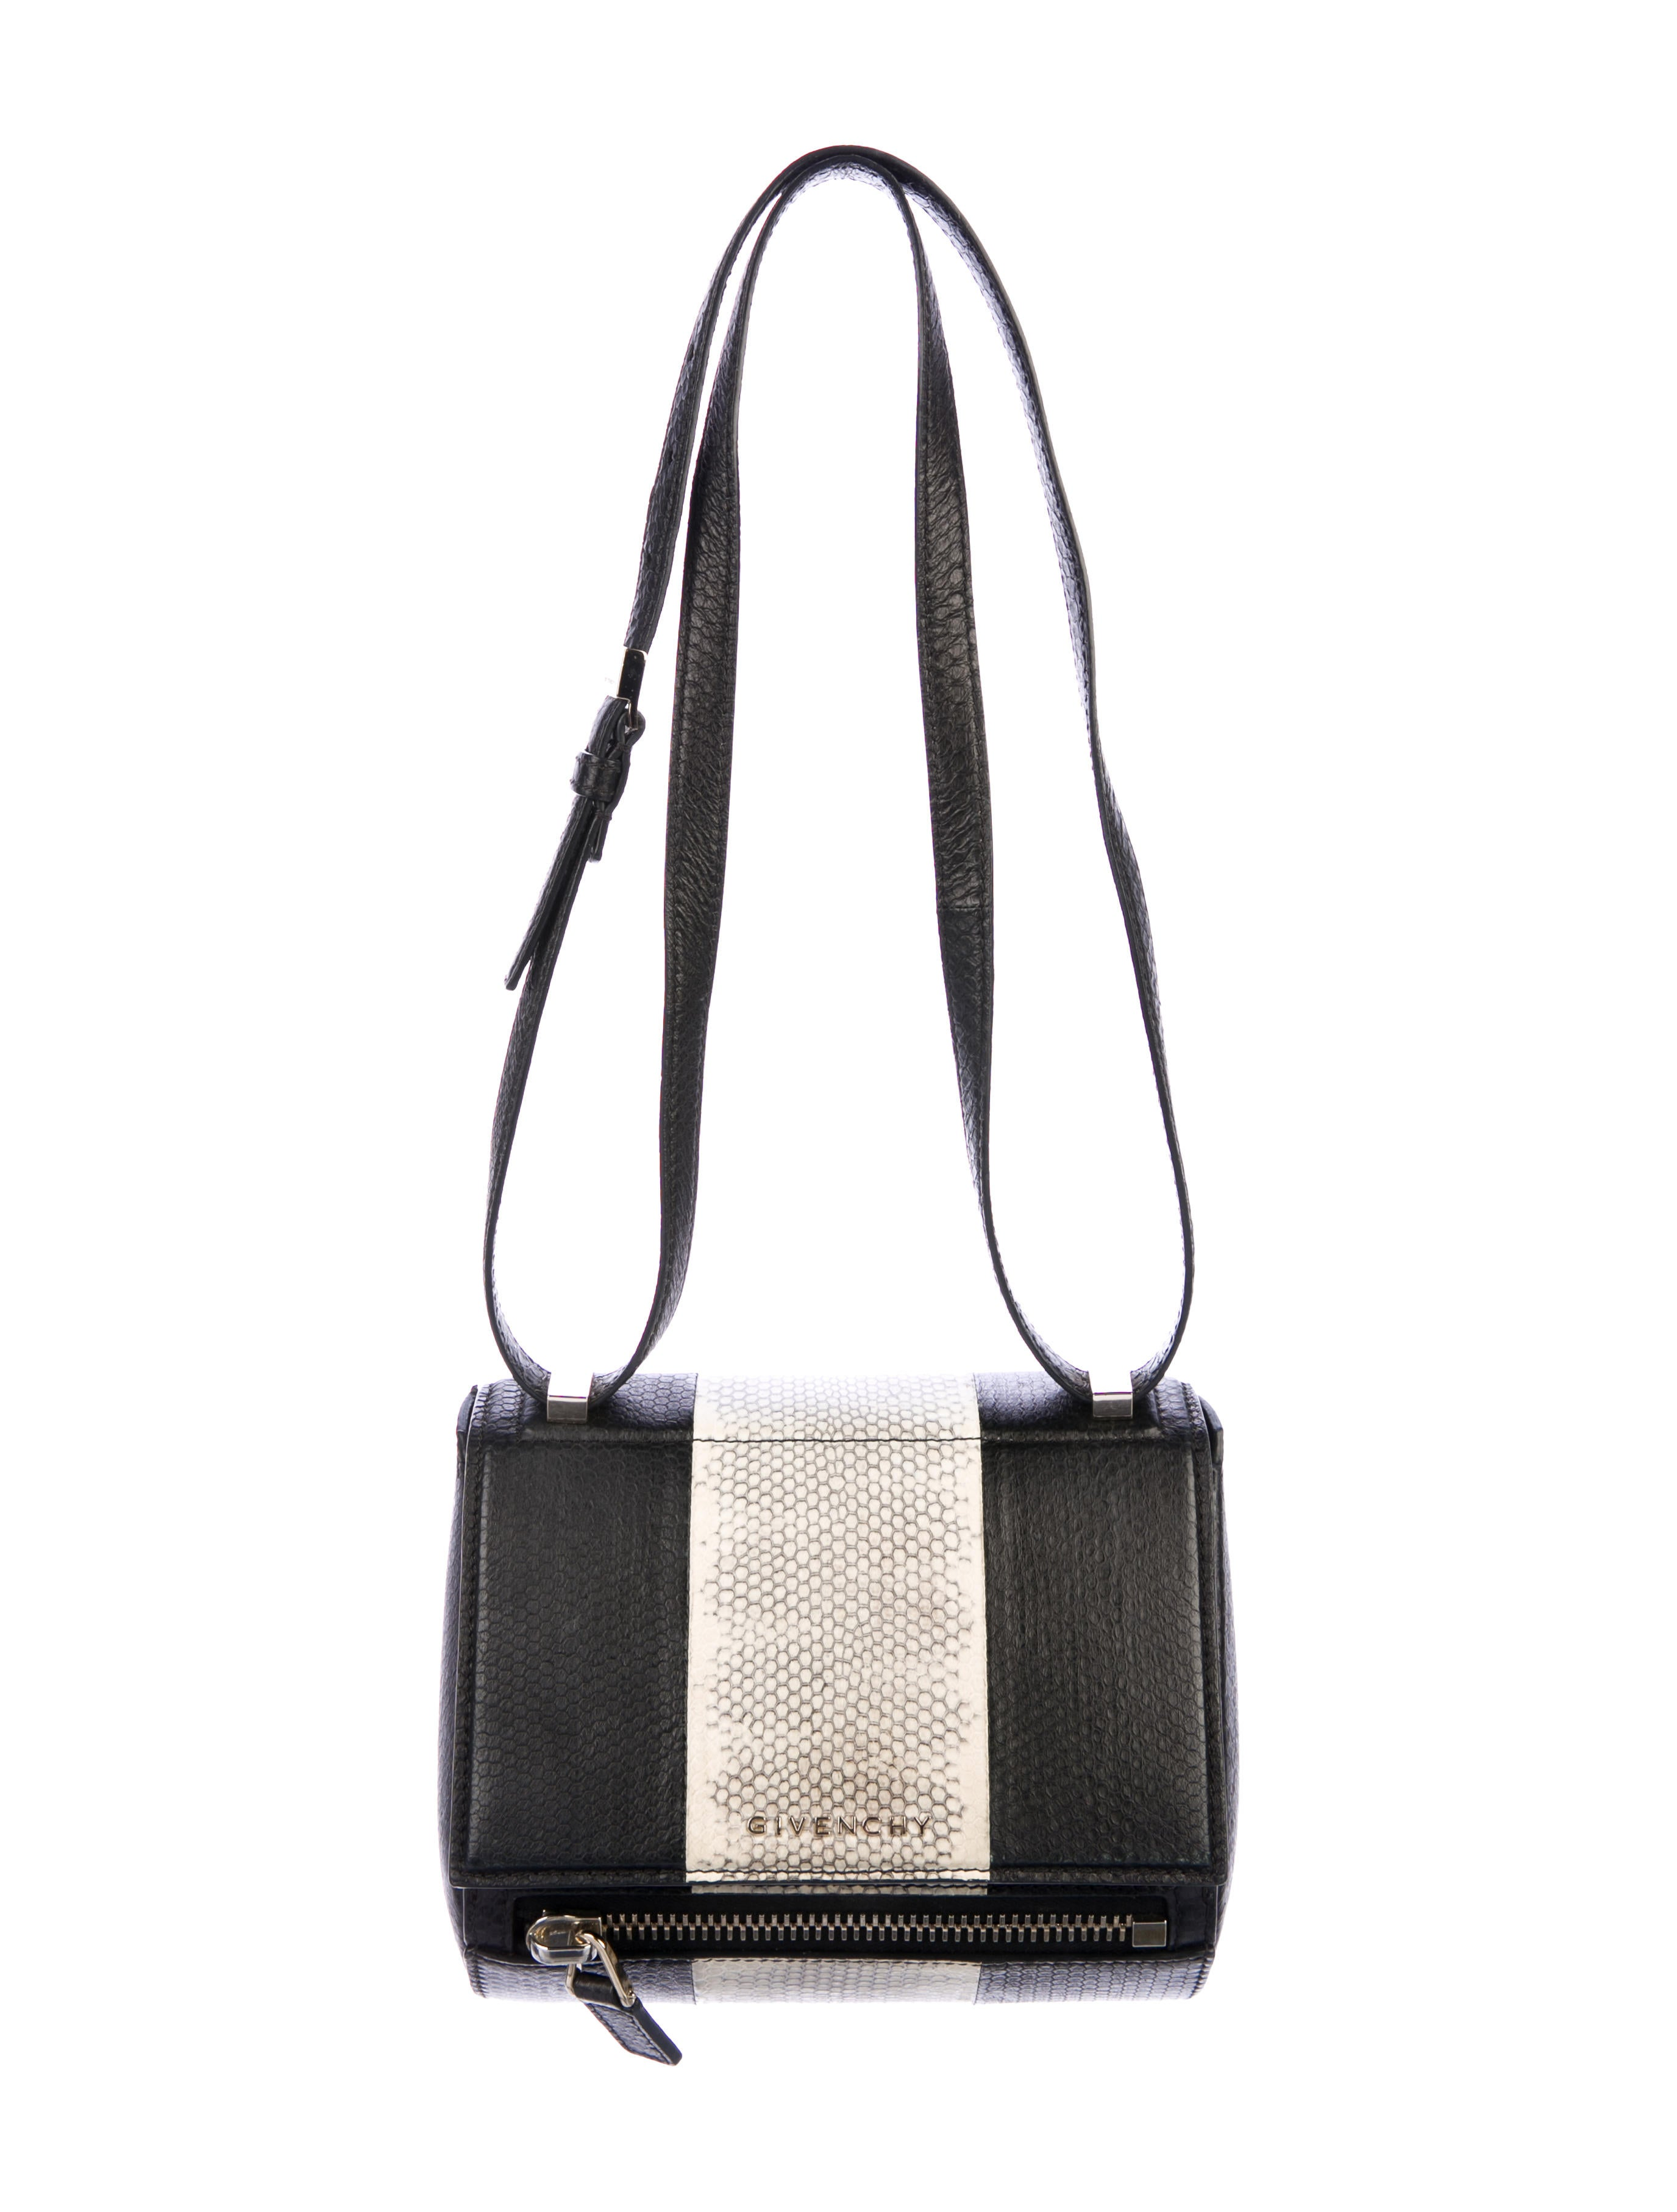 fd13a7800e641 Givenchy Mini Pandora Box Bag - Handbags - GIV56442